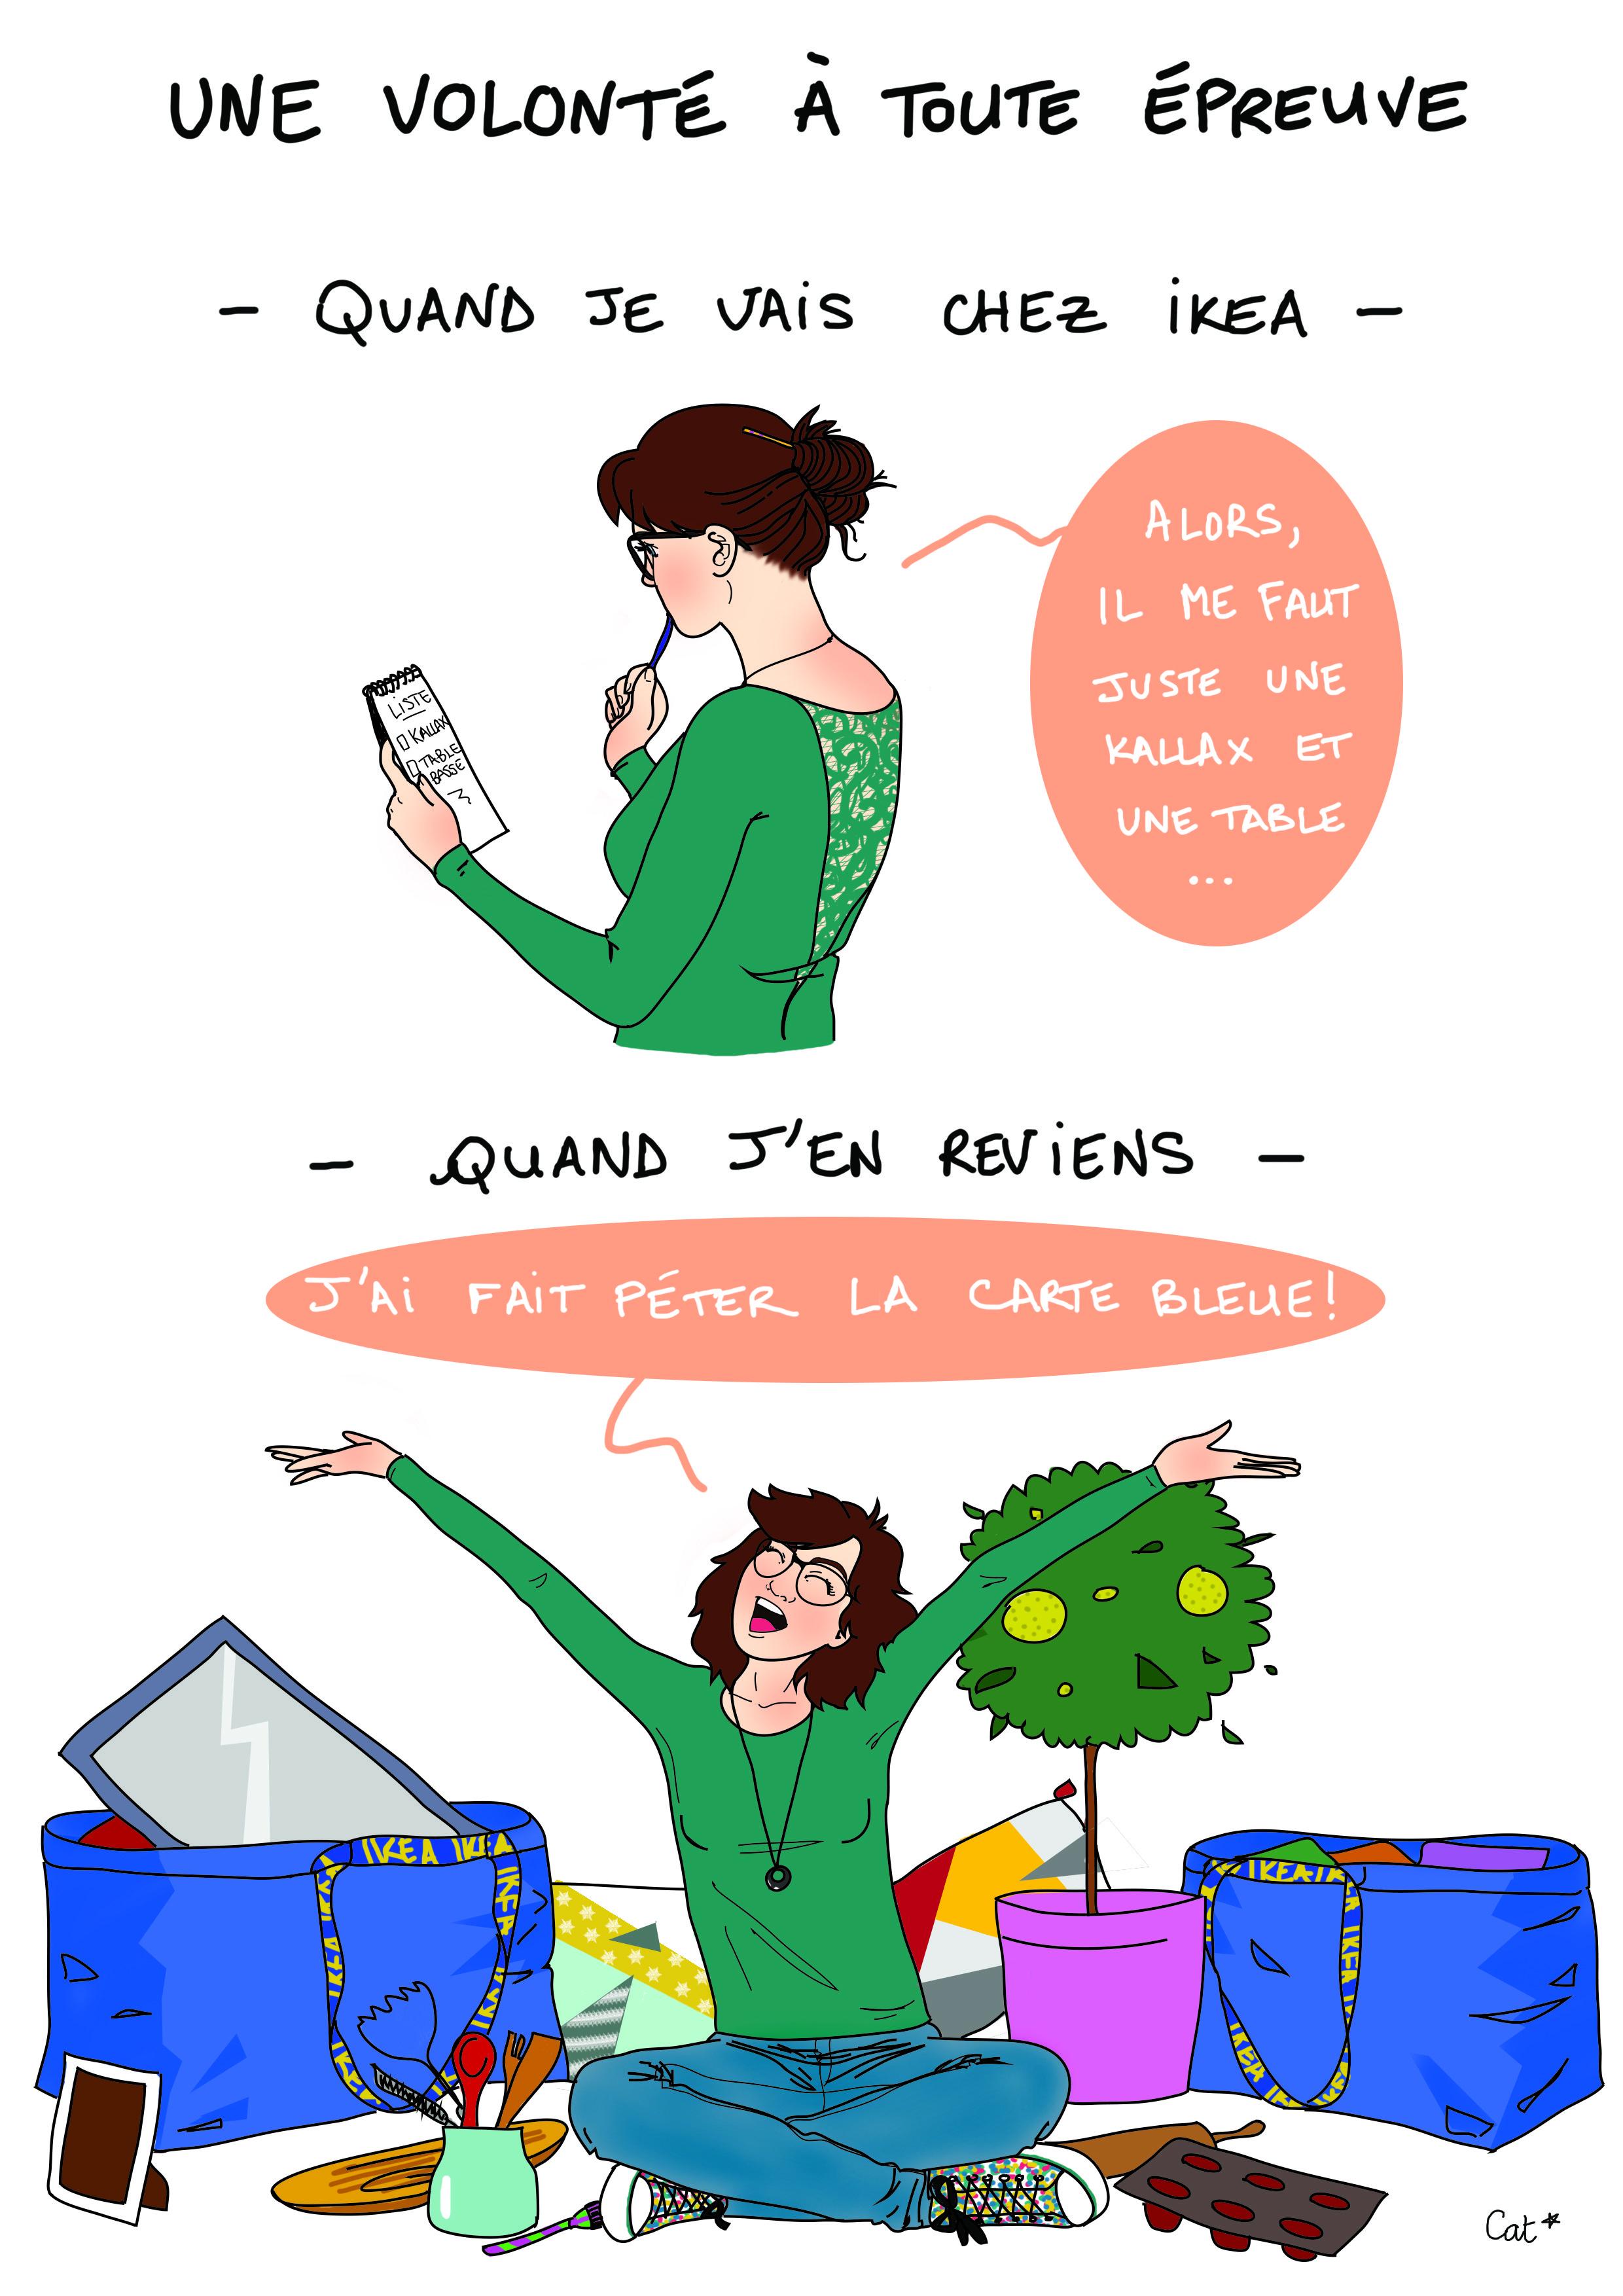 ikea, dessin, illustration, humour, volonté, achats, shopping.